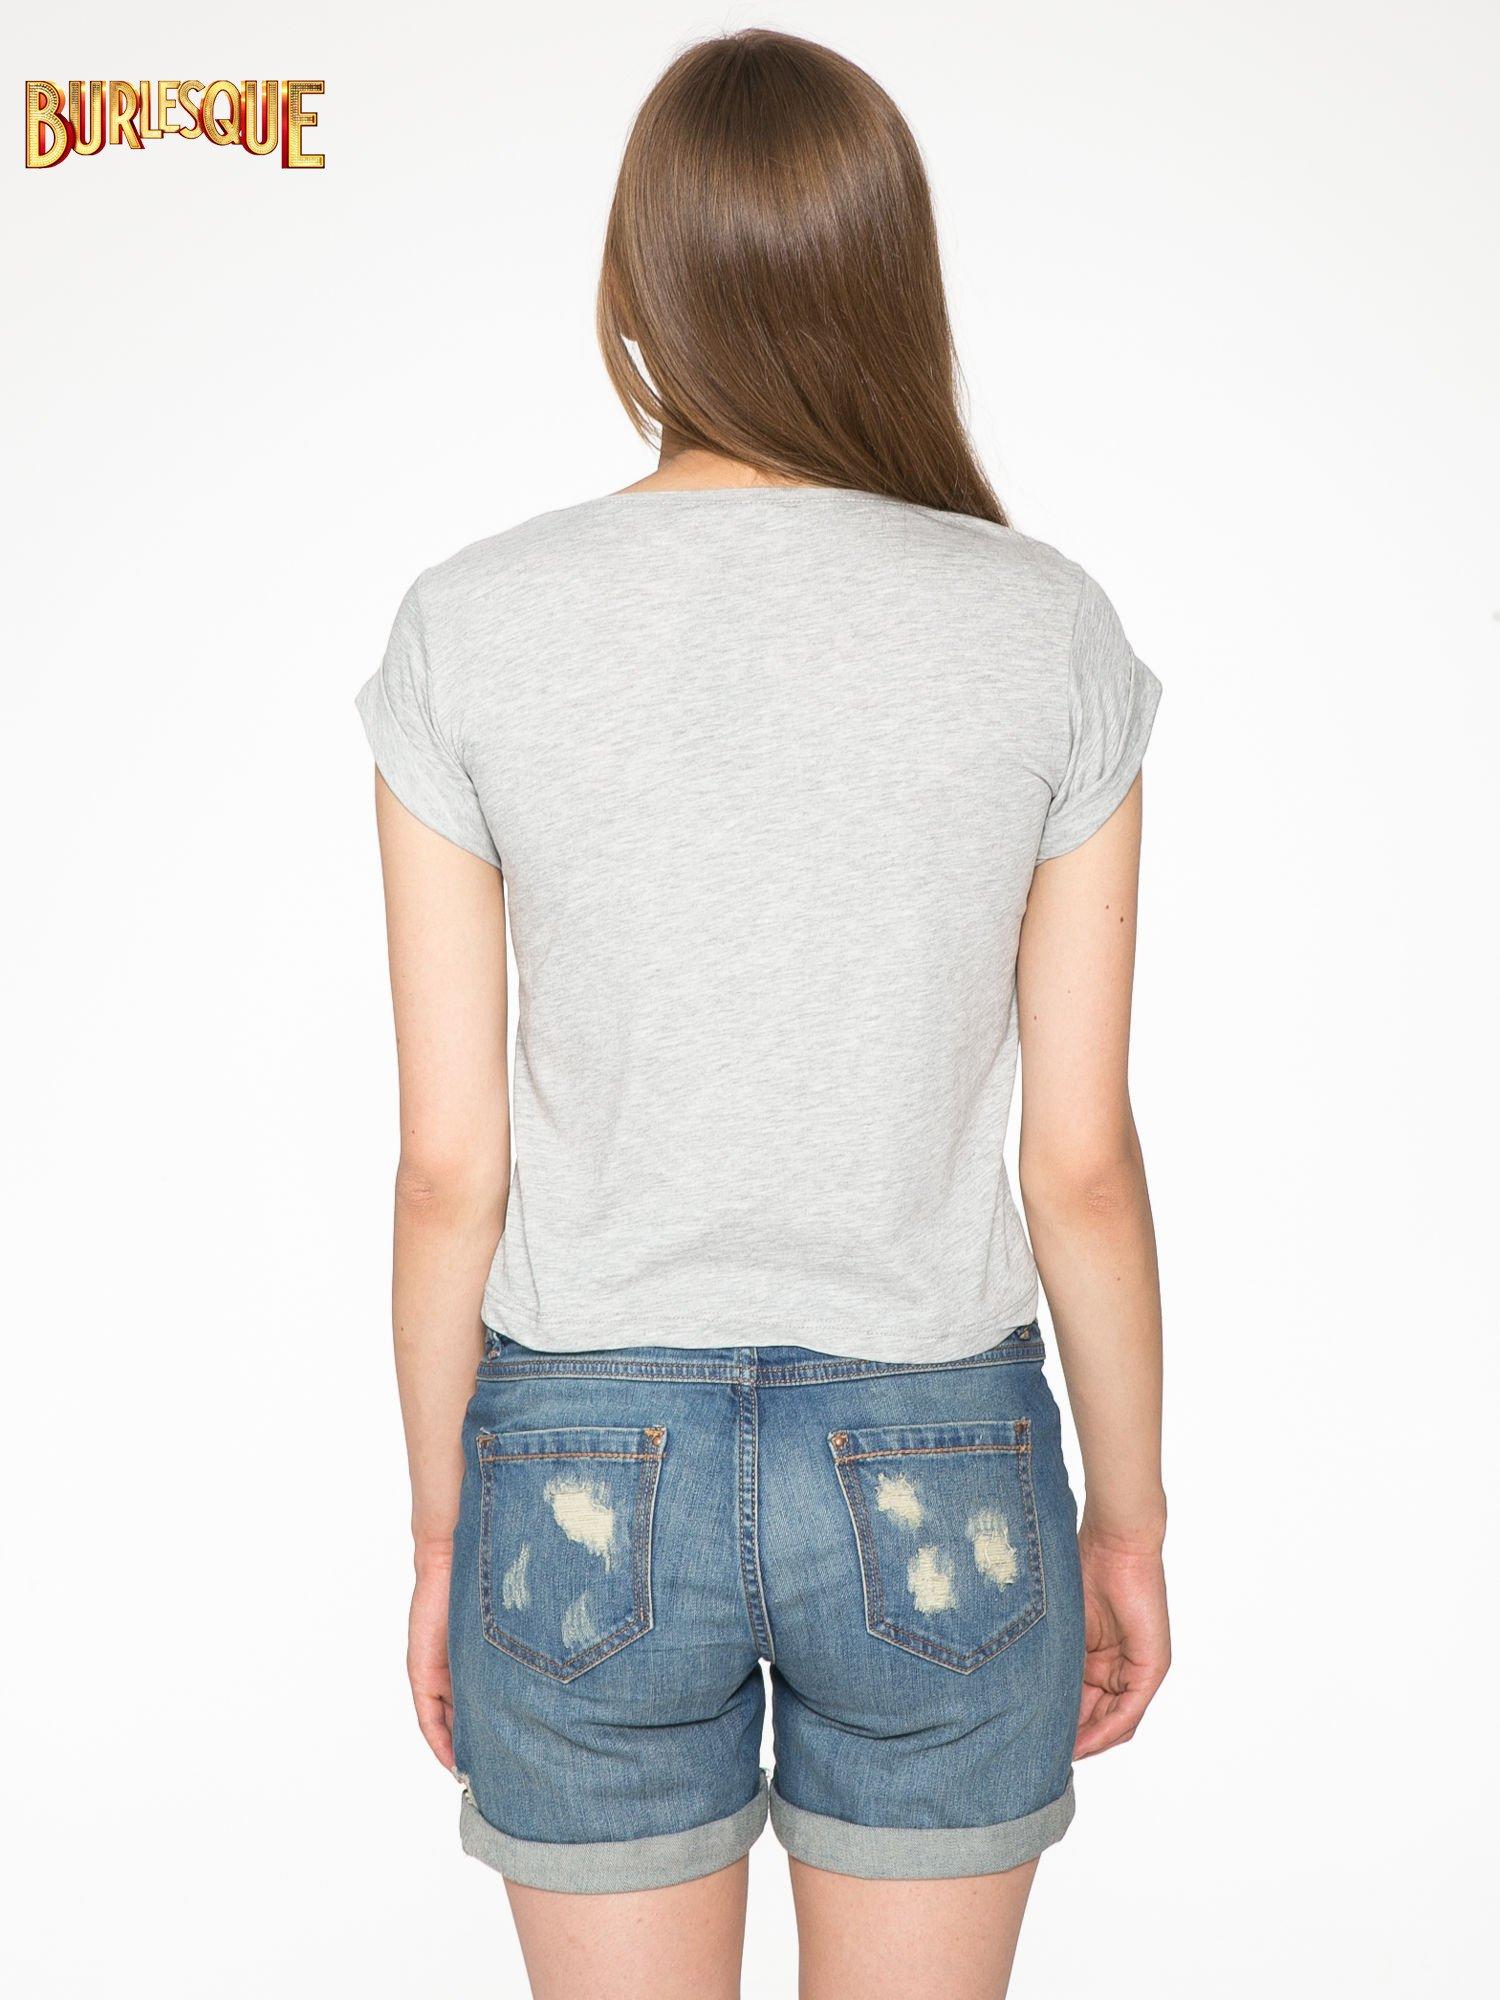 Szary krótki t-shirt z nadrukiem stokrotek i napisem                                  zdj.                                  4